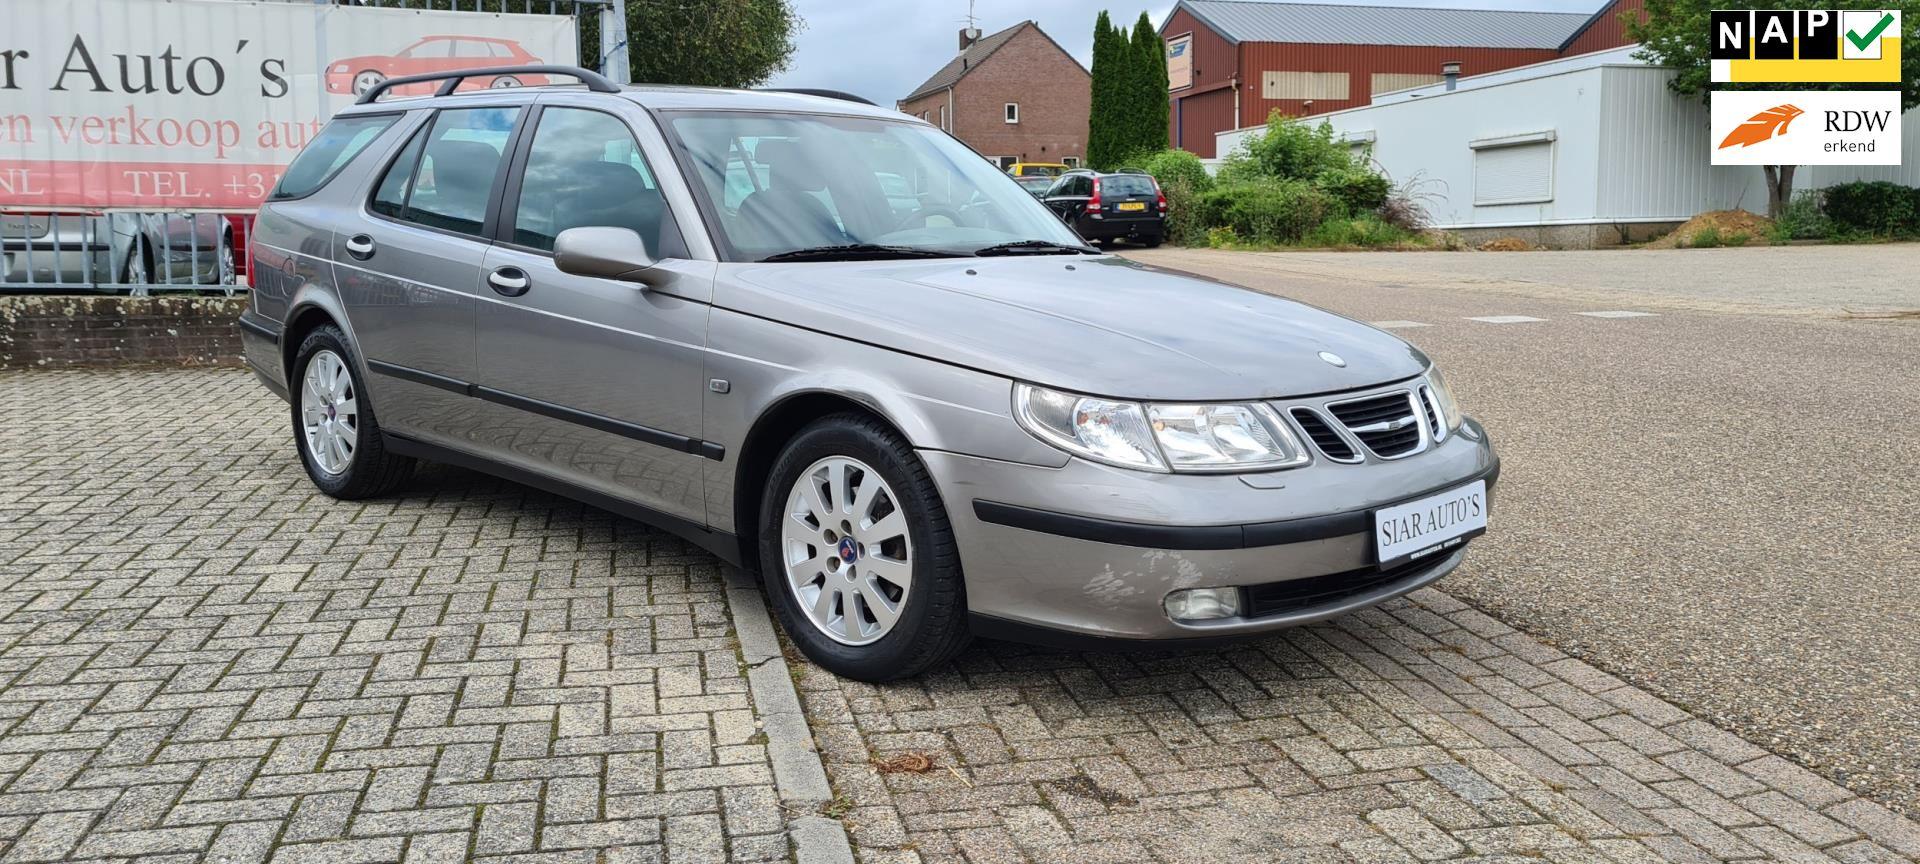 Saab 9-5 Estate occasion - Siar Auto's